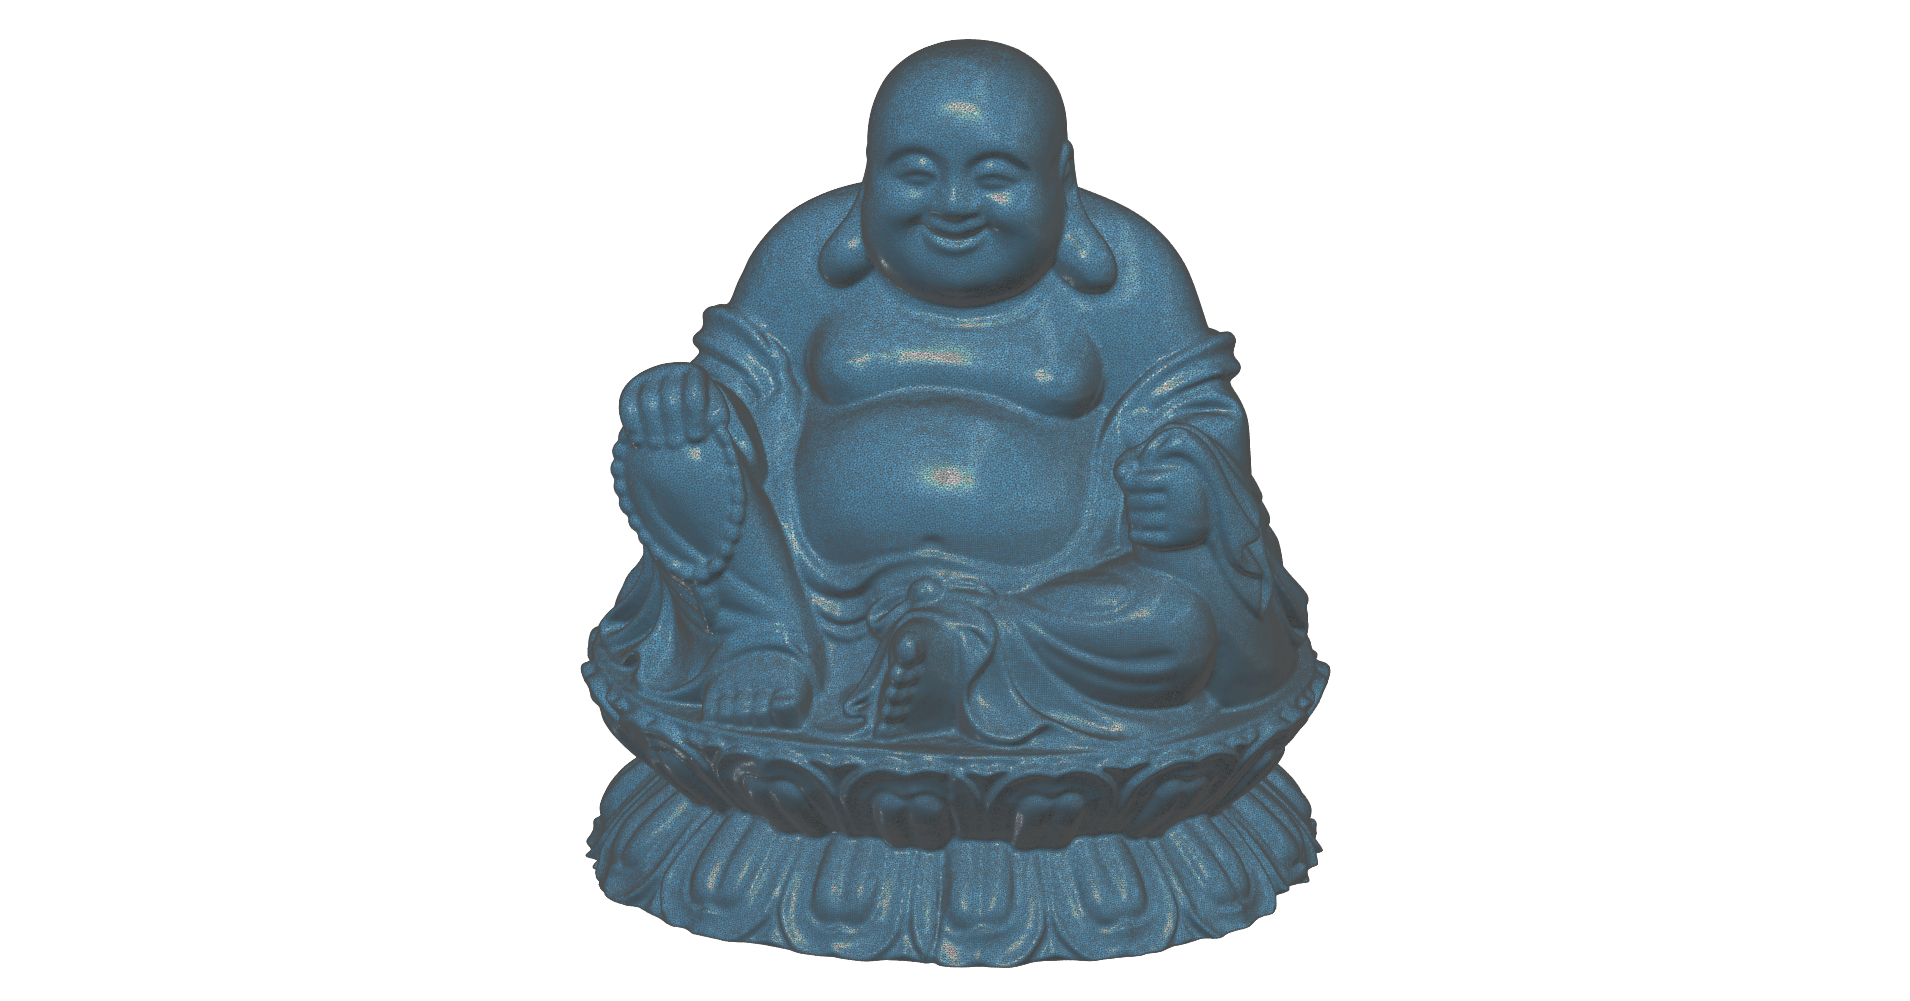 Buddha2.png Download free STL file Buddha • Model to 3D print, Icenvain